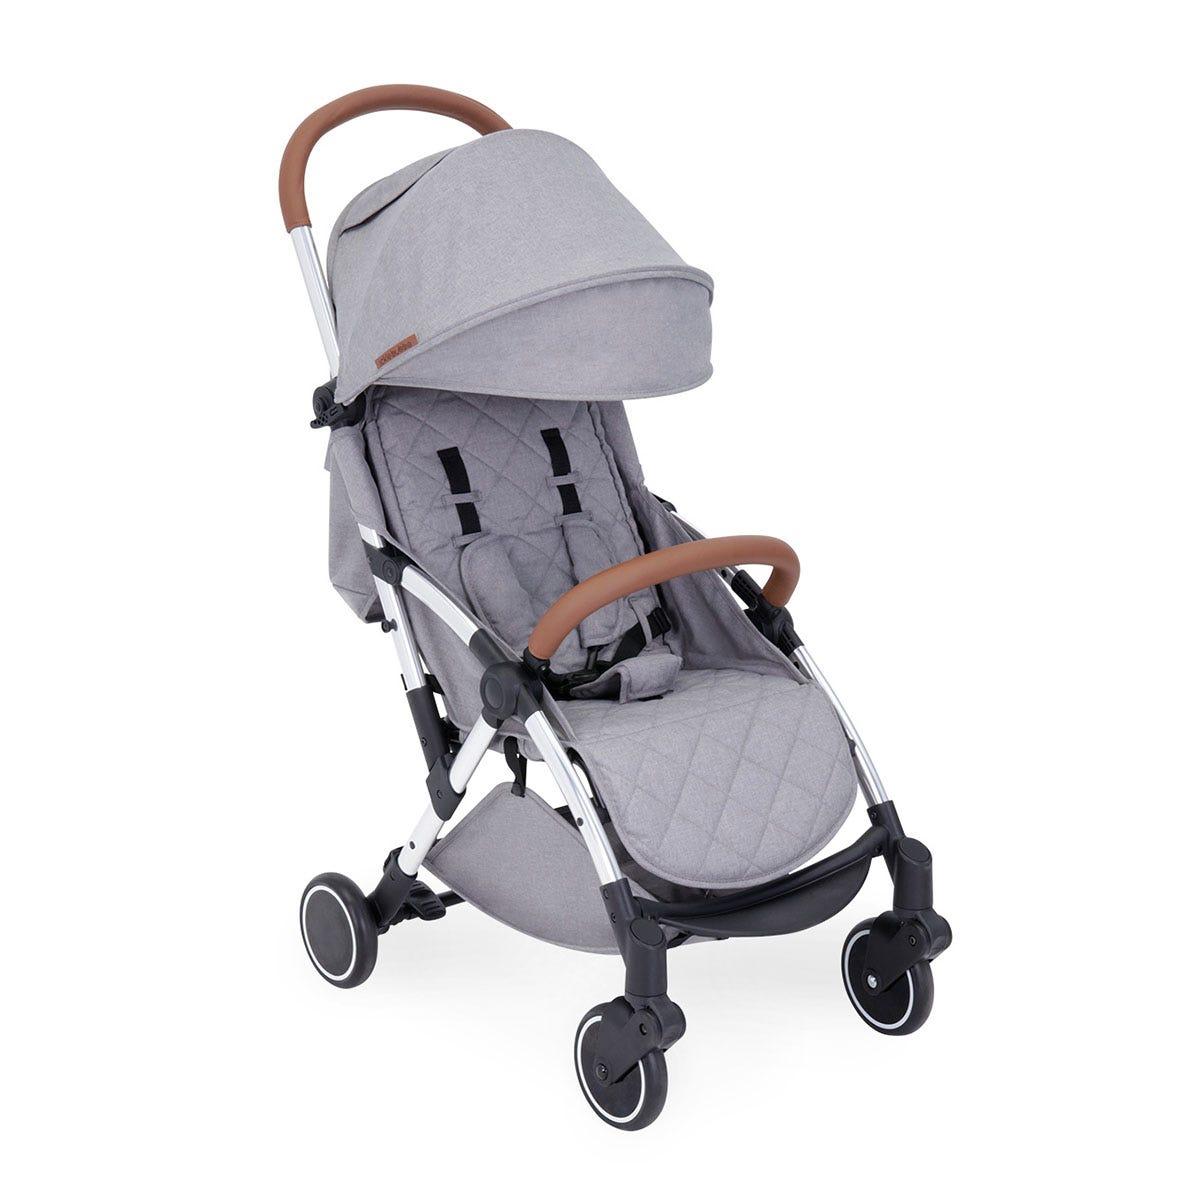 Ickle Bubba Globe Stroller - Grey on Silver